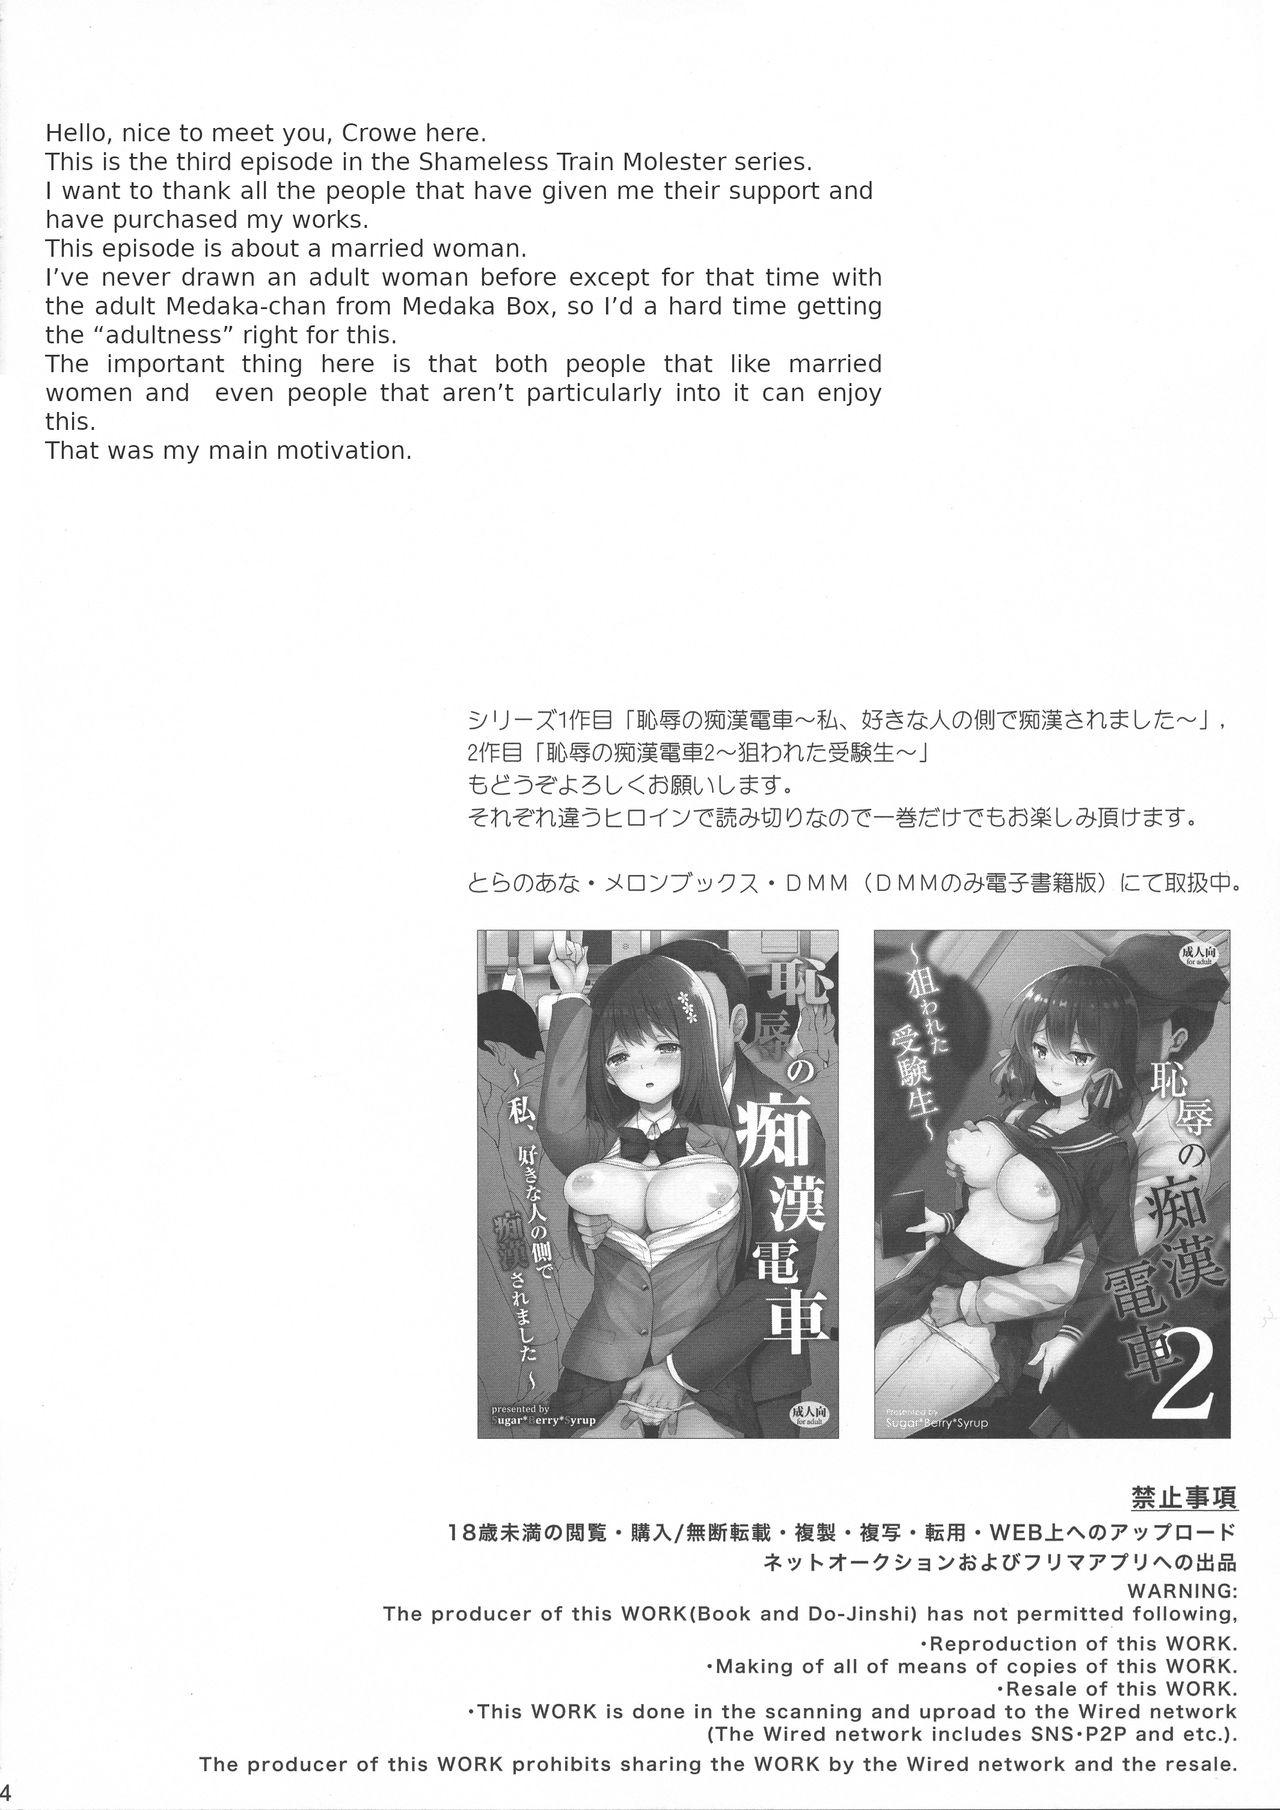 (C94) [Sugar*Berry*Syrup (Crowe)] Chijoku no Chikan Densha 3 ~ Hitozuma Shanai Kyousei Junyuu ~ | Shameless Train Molester 3 ~ Forcing a Married Woman to Breastfeed in the Train ~ [English] [The Chrysanthemum Translations] 3